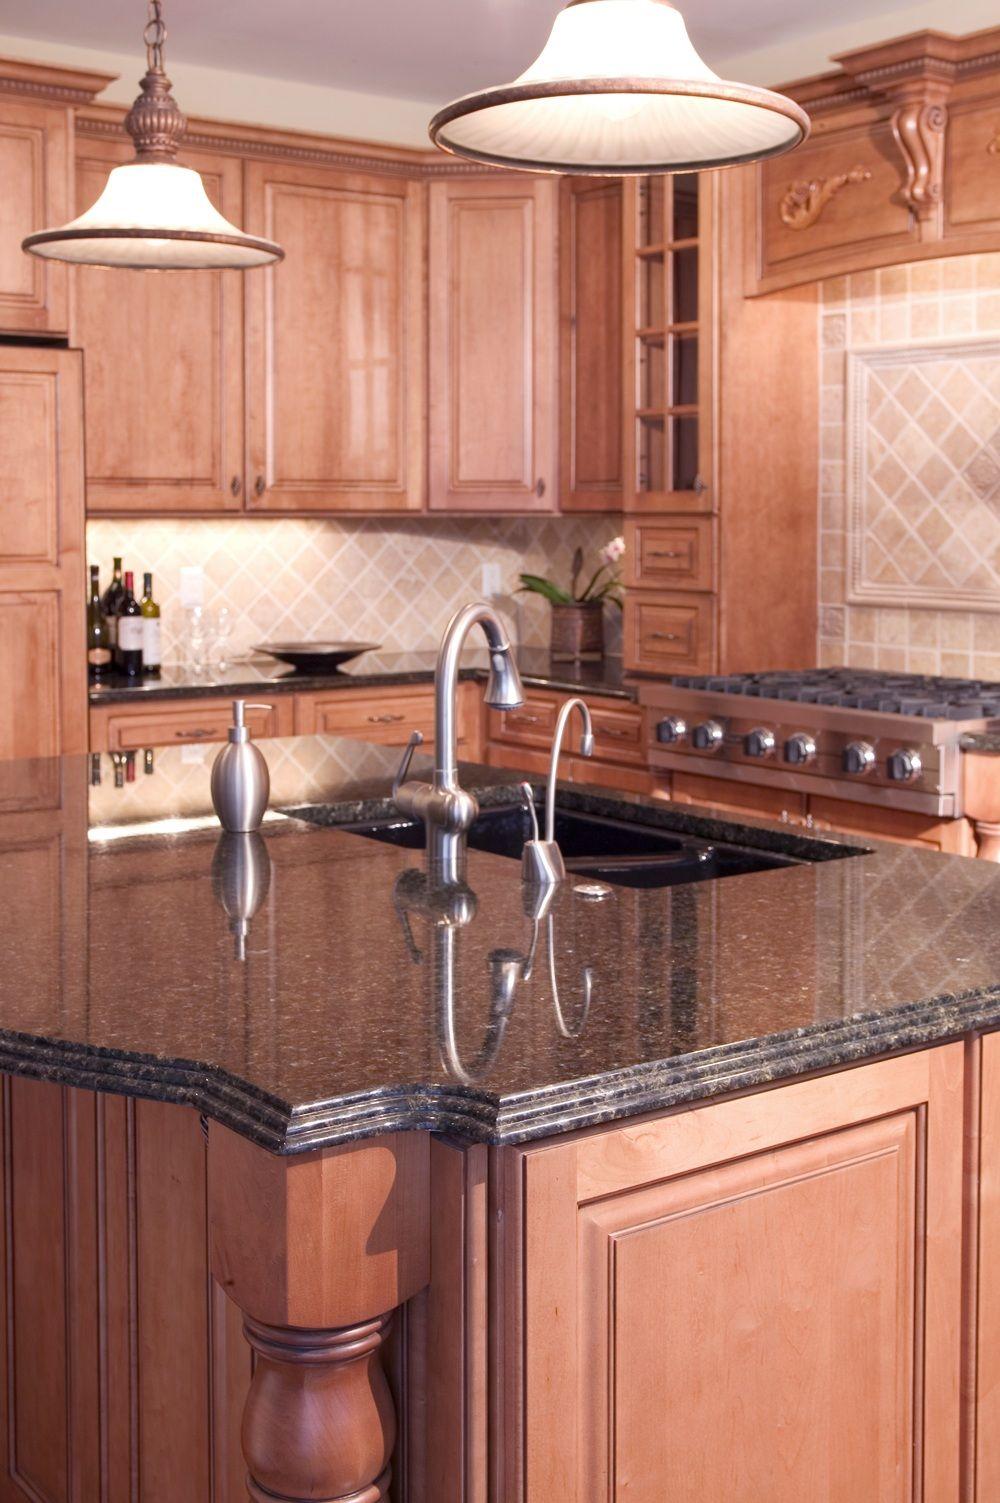 kitchen island countertop kitchen cabinets and countertops beige granite countertop colors yellow granite countertop colors black